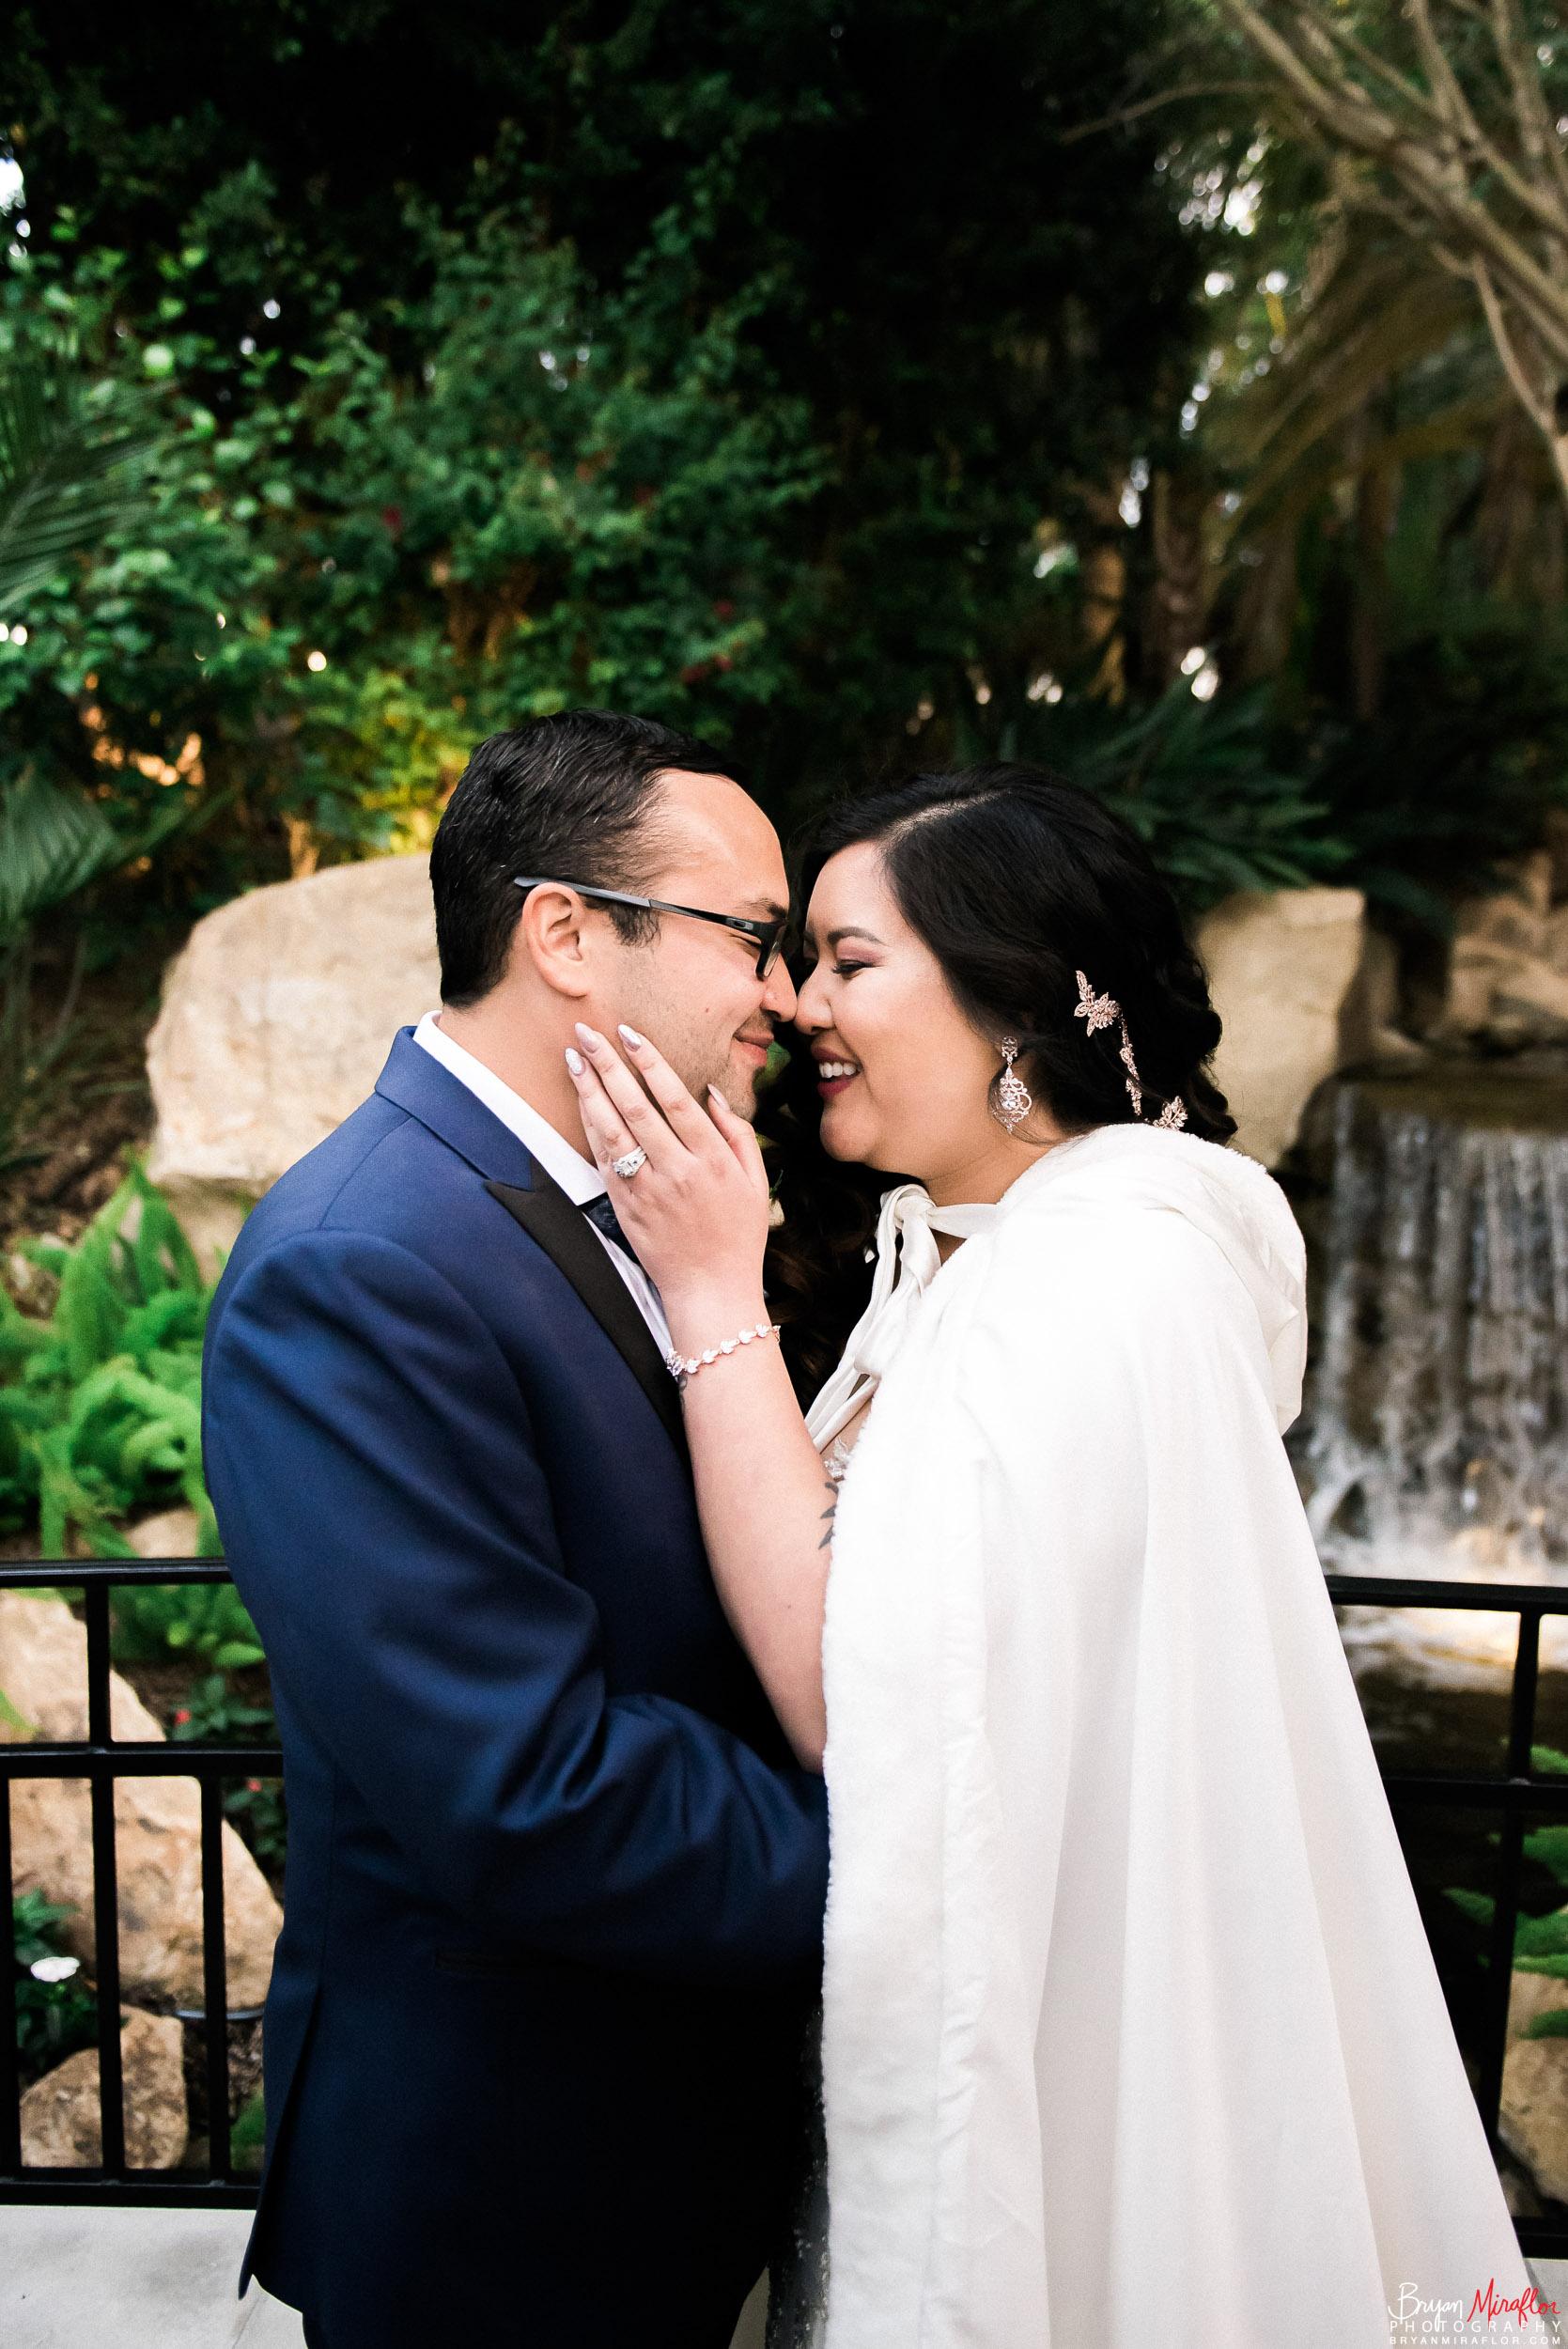 Bryan-Miraflor-Photography-Hannah-Jonathan-Married-Grand-Traditions-Estate-Gardens-Fallbrook-20171222-008.jpg